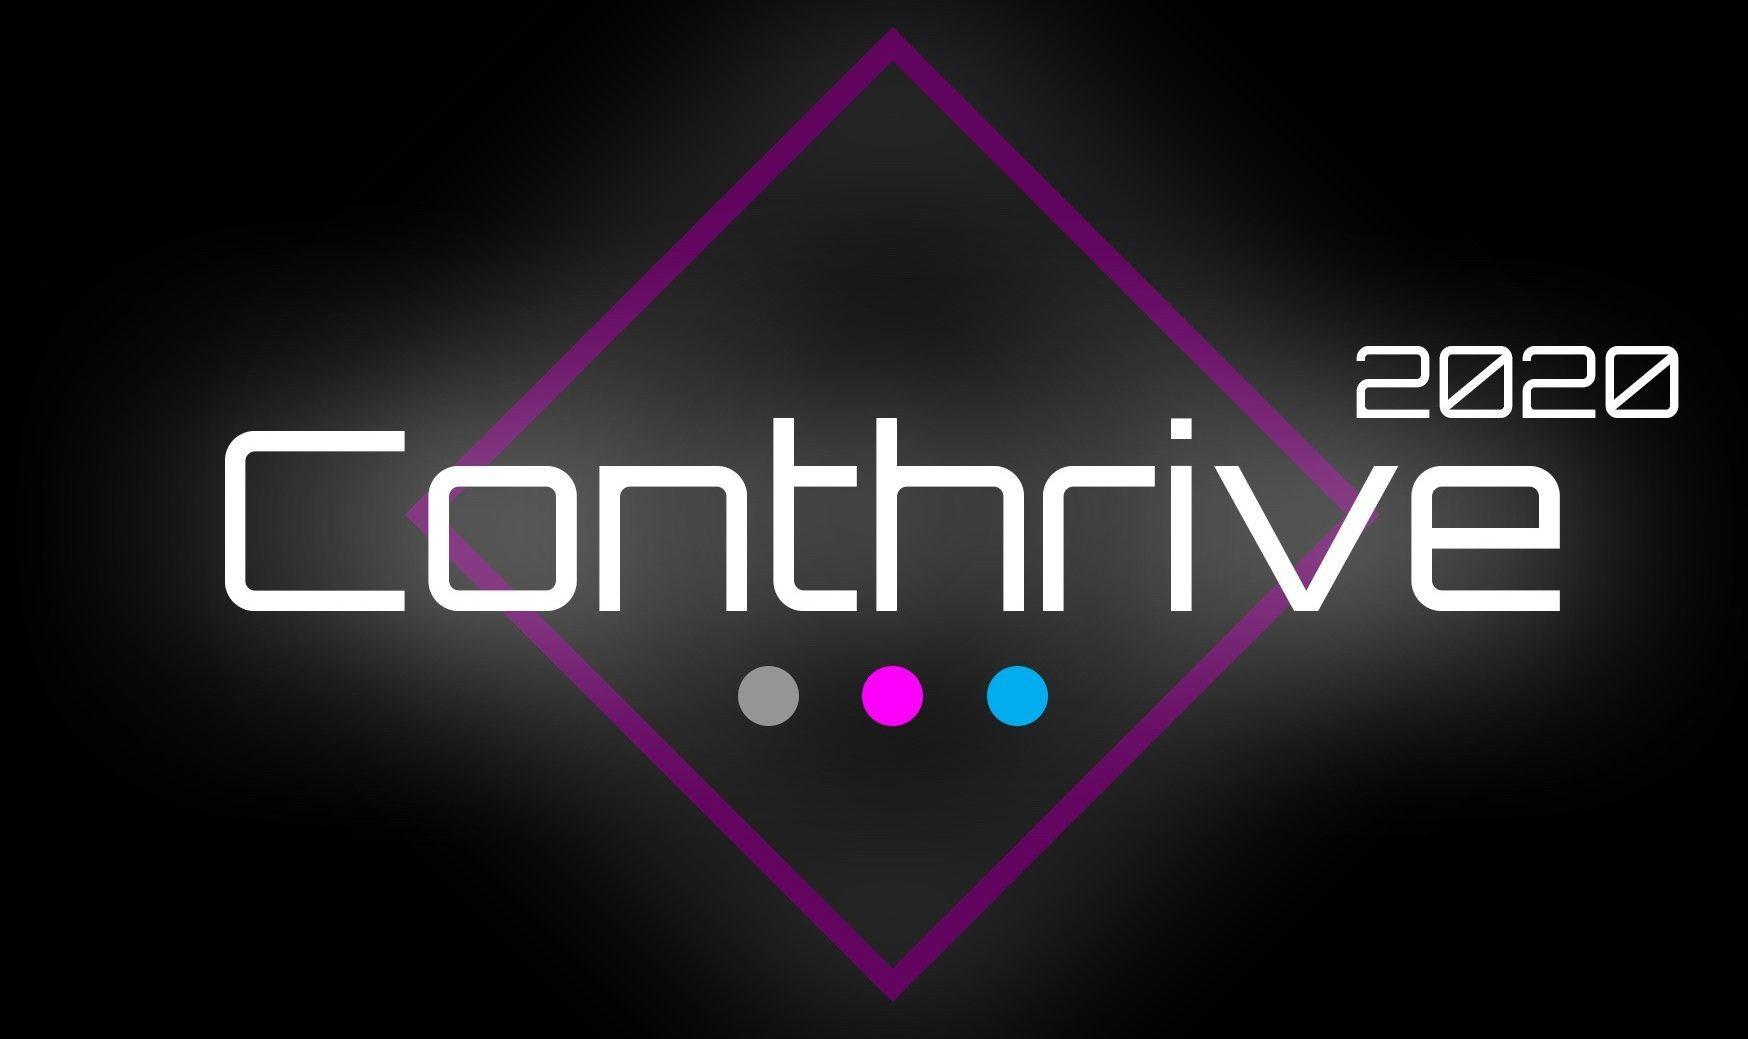 conthrive logo